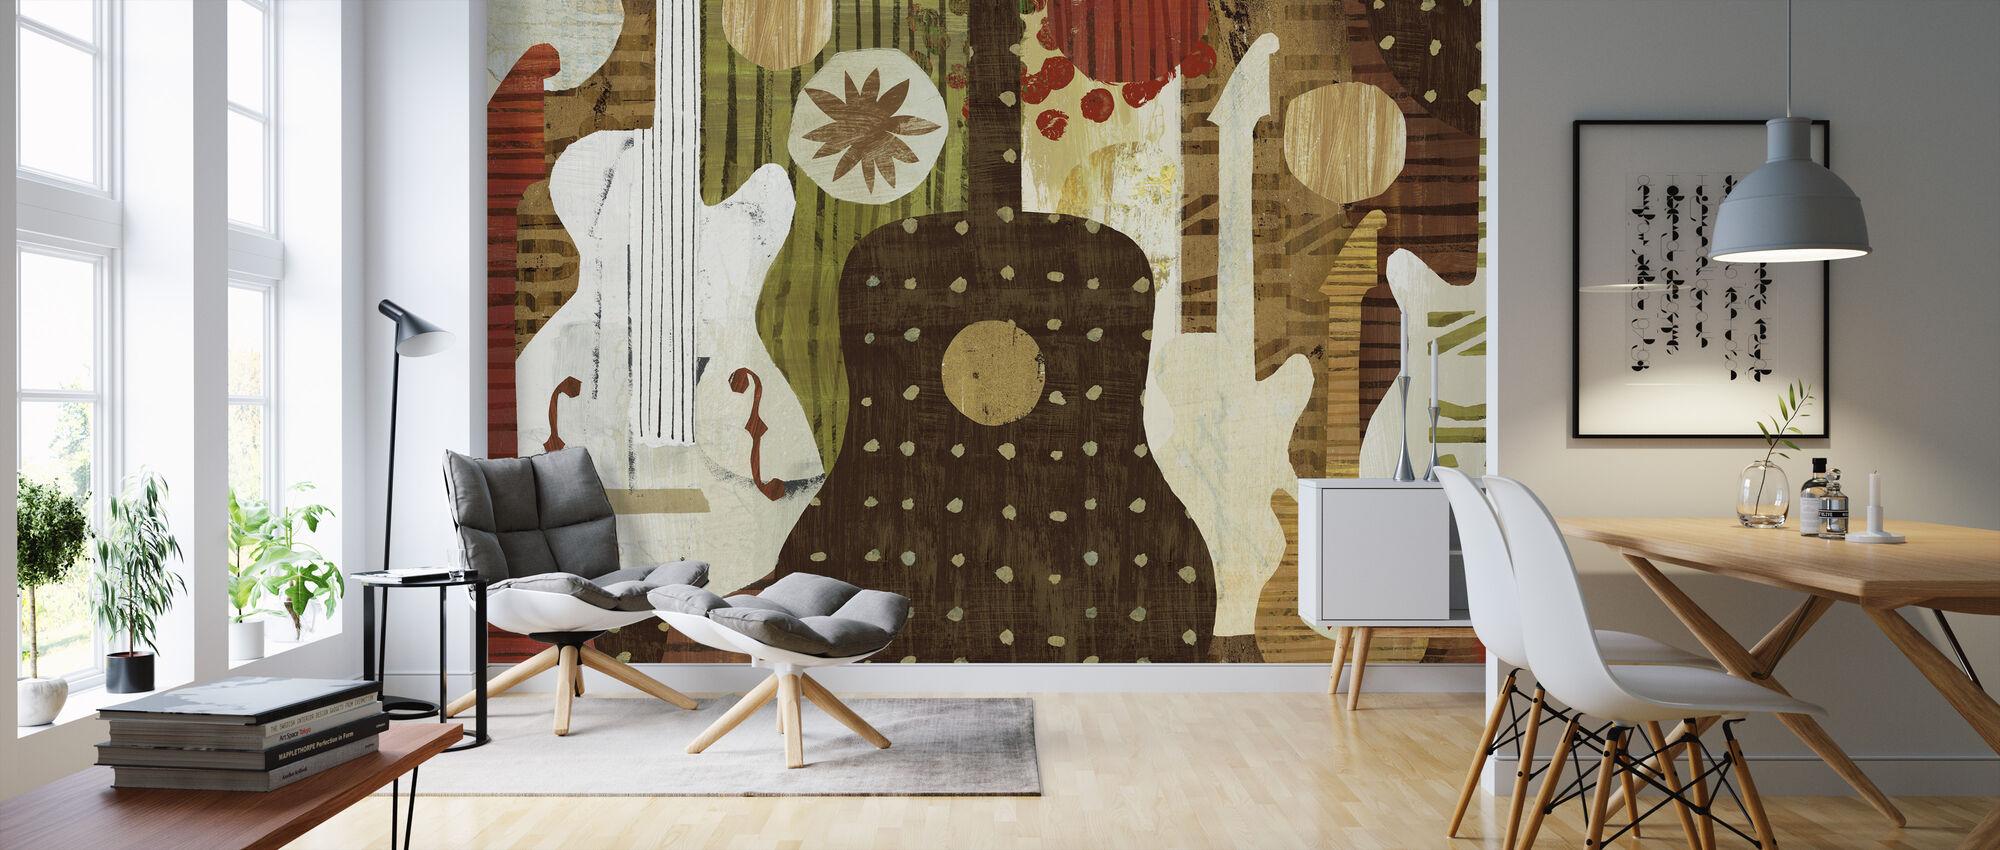 Rock and Roll Fantasy - Wallpaper - Living Room